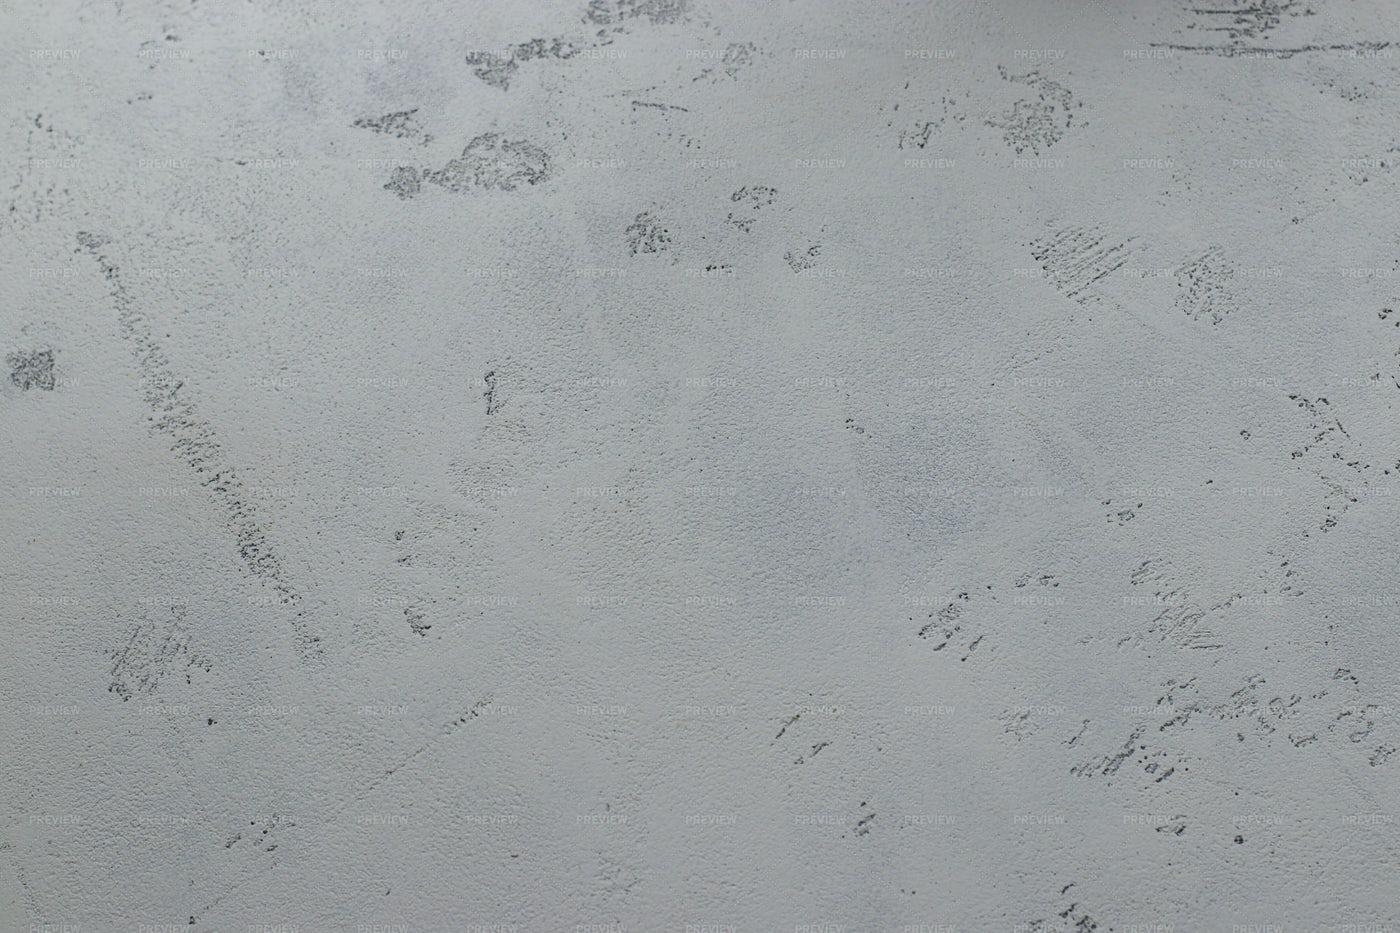 Gray Concrete Surface Background: Stock Photos